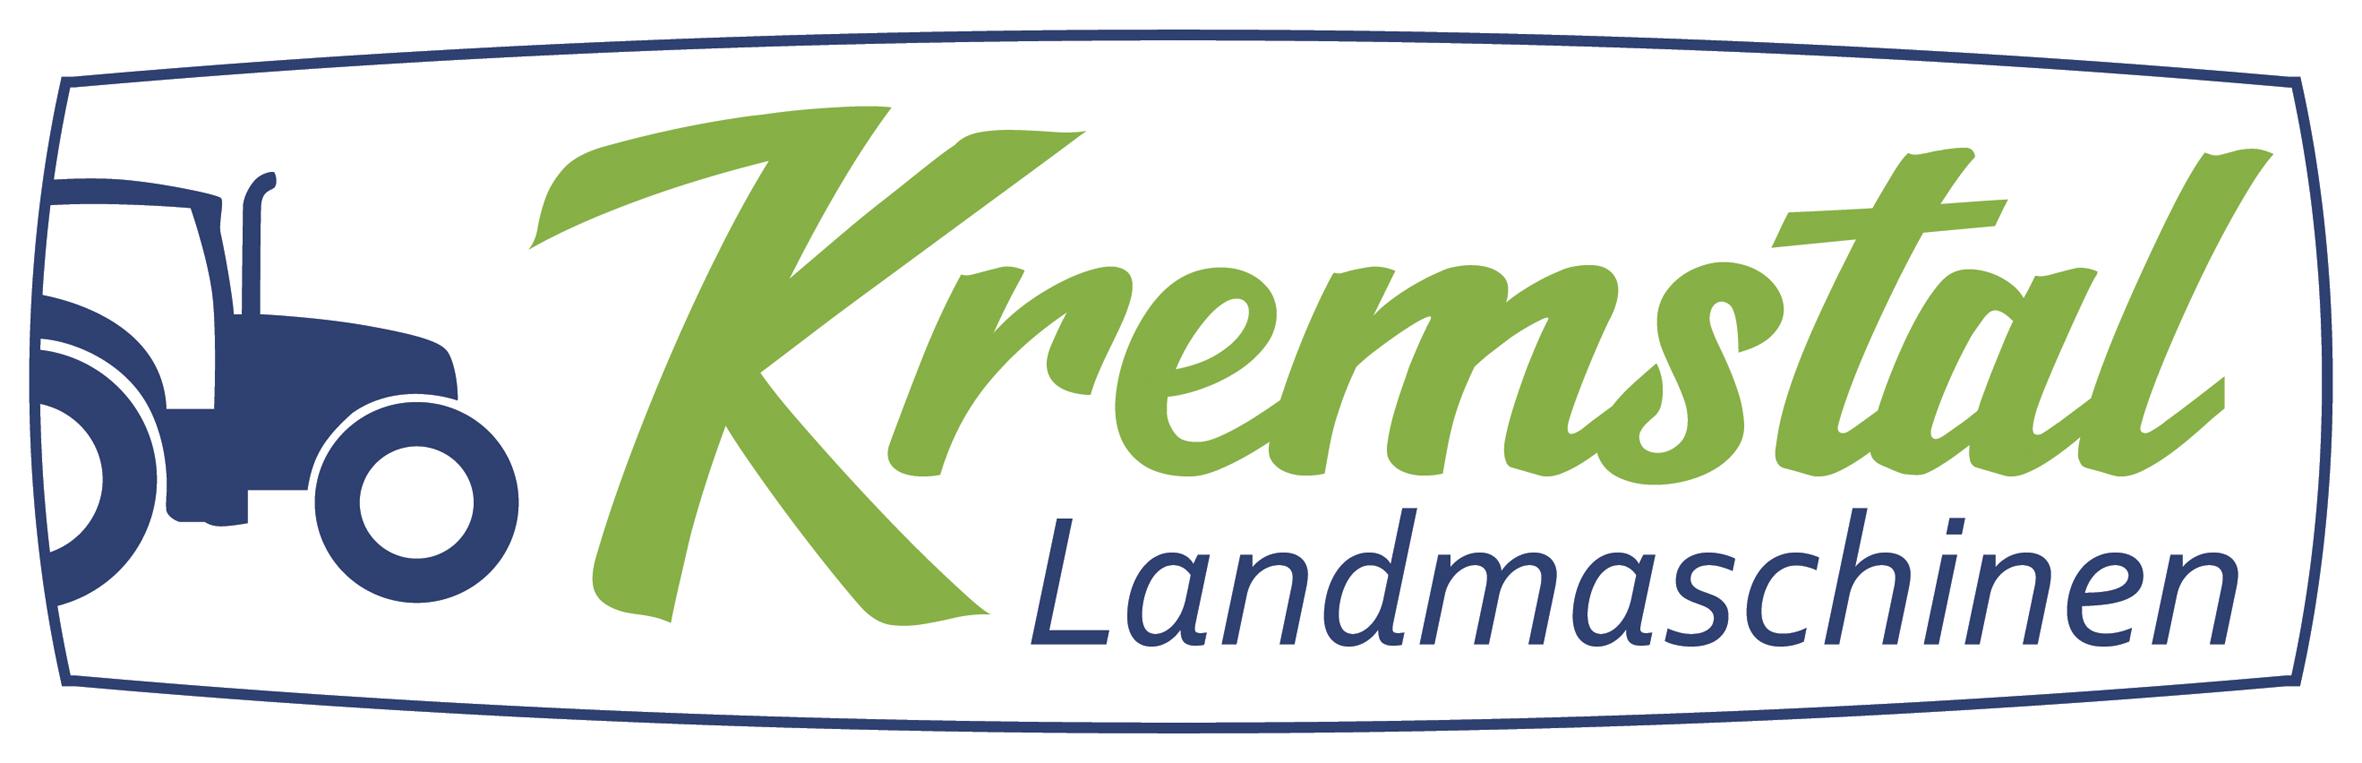 Landmaschinen Kremstal GmbH